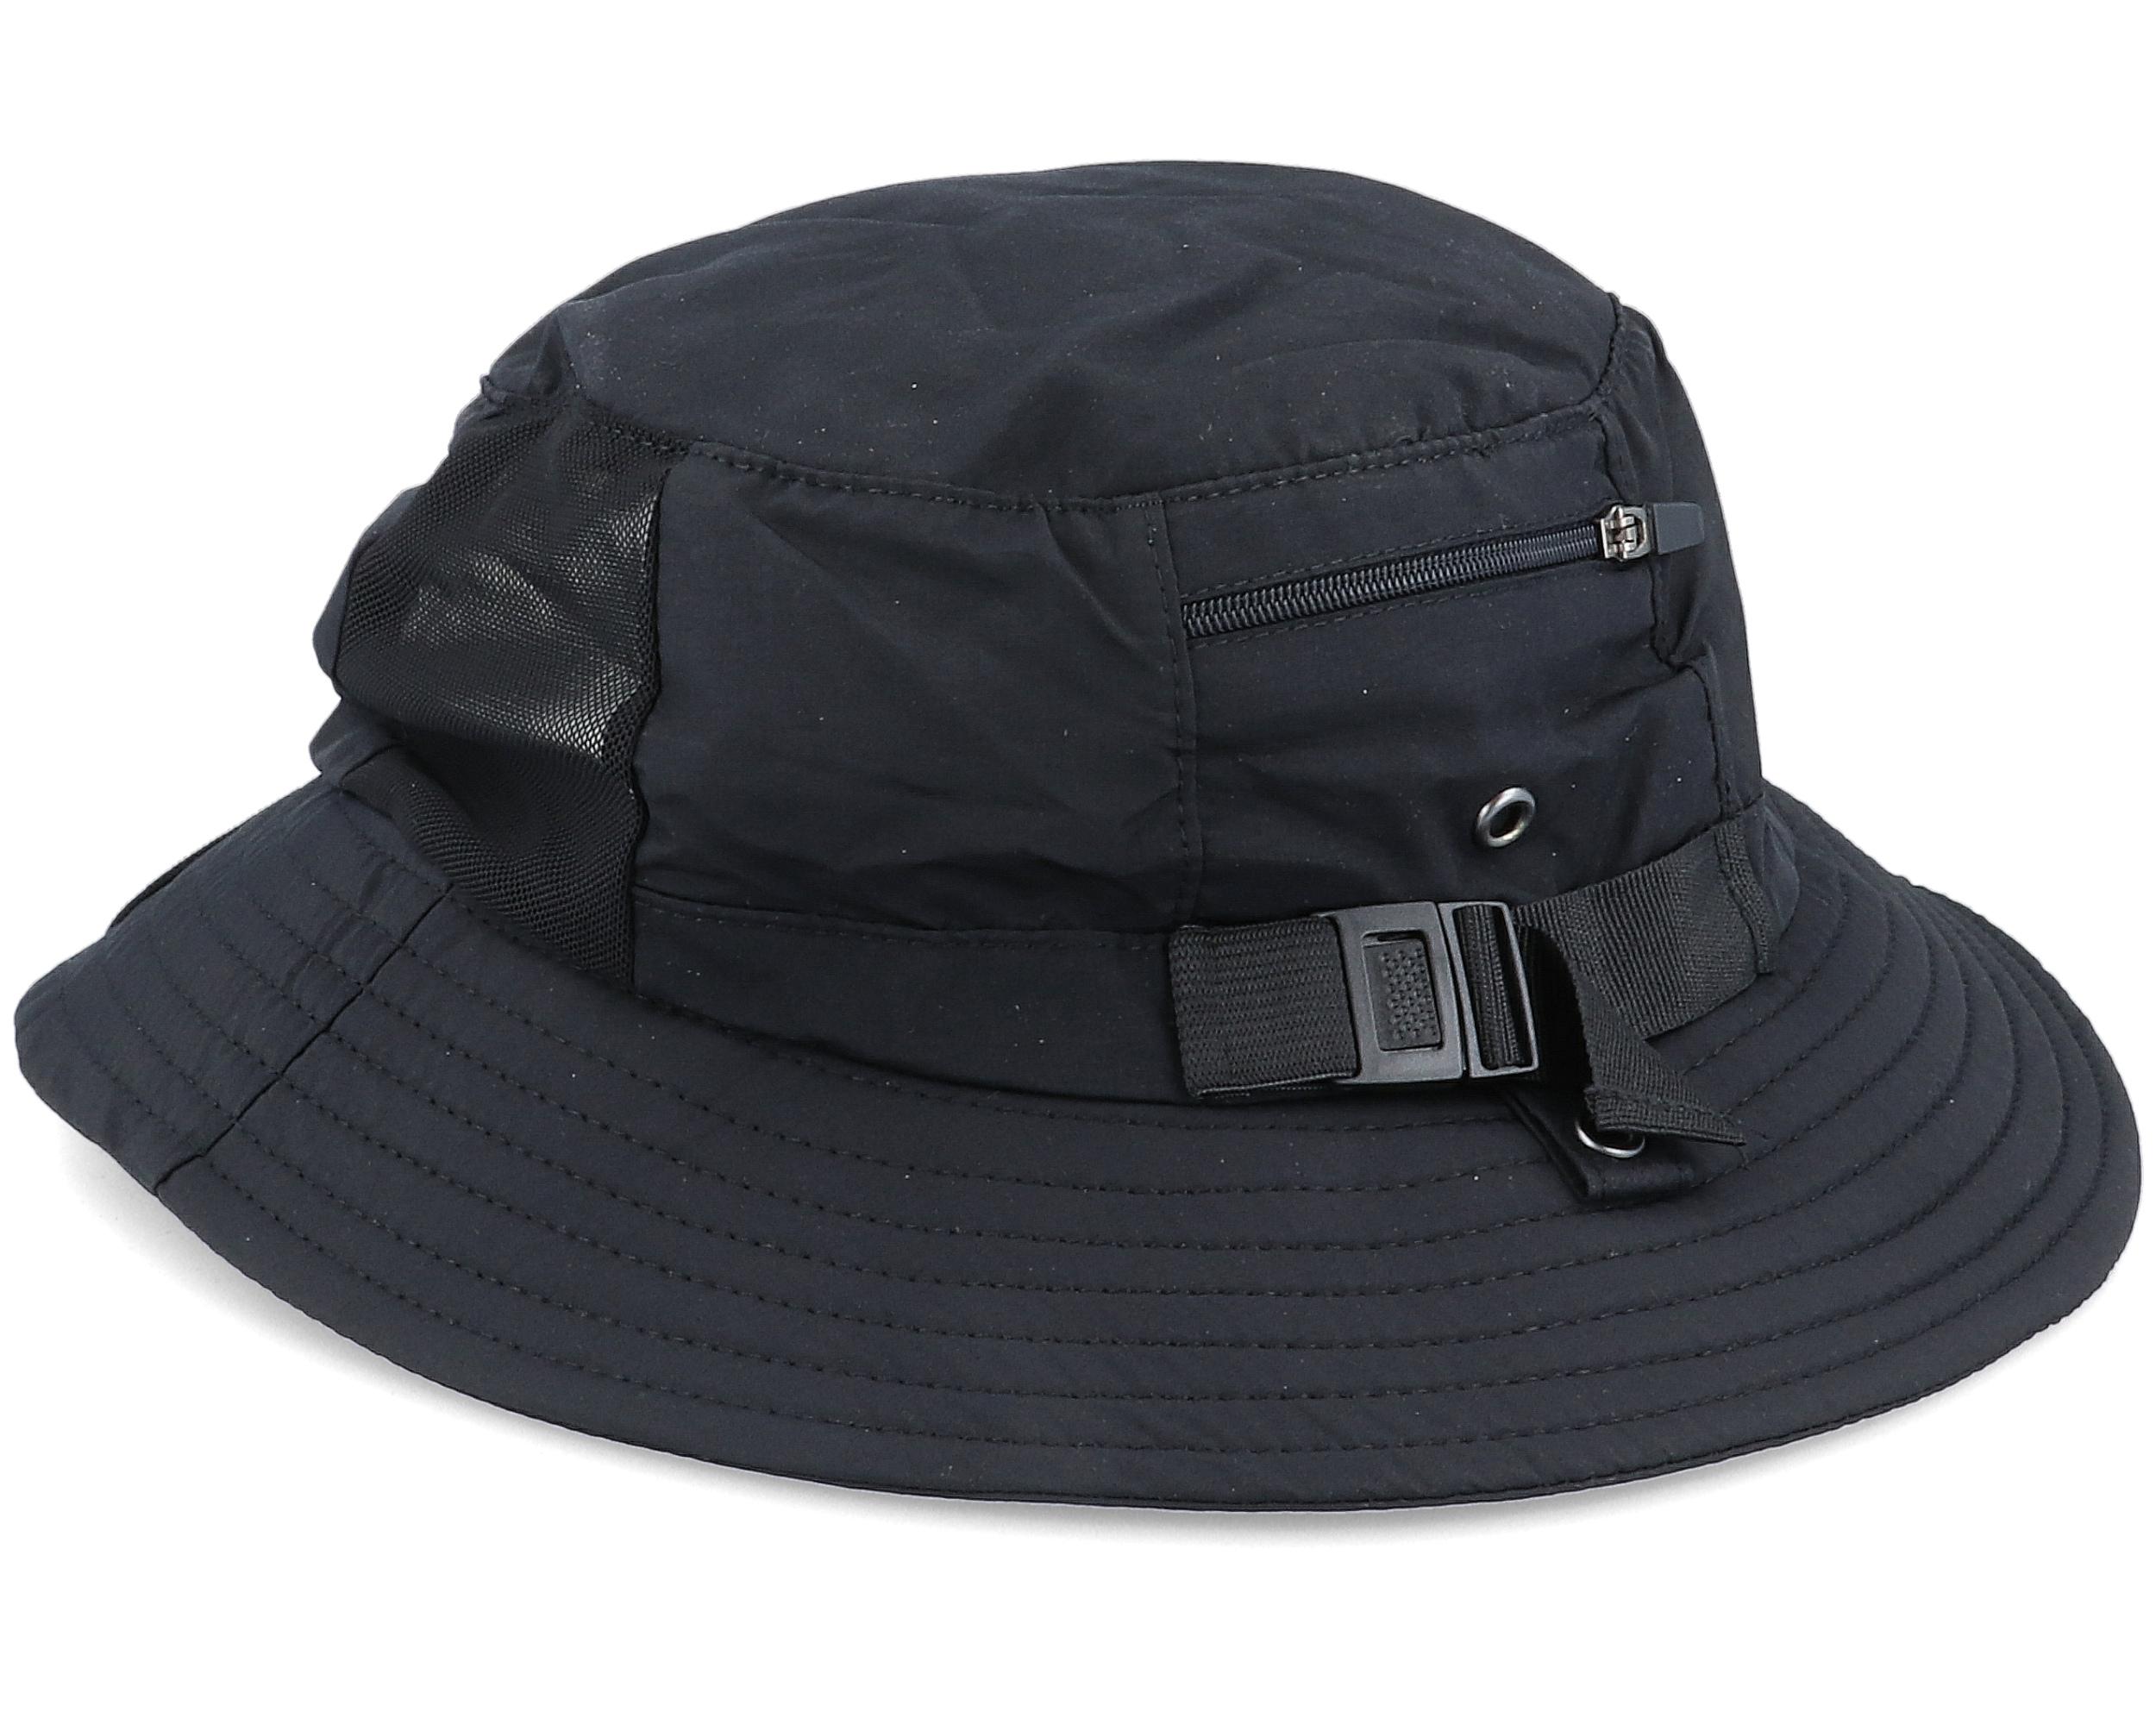 BM Watch Cap - Black   Cap, Black, Knitting